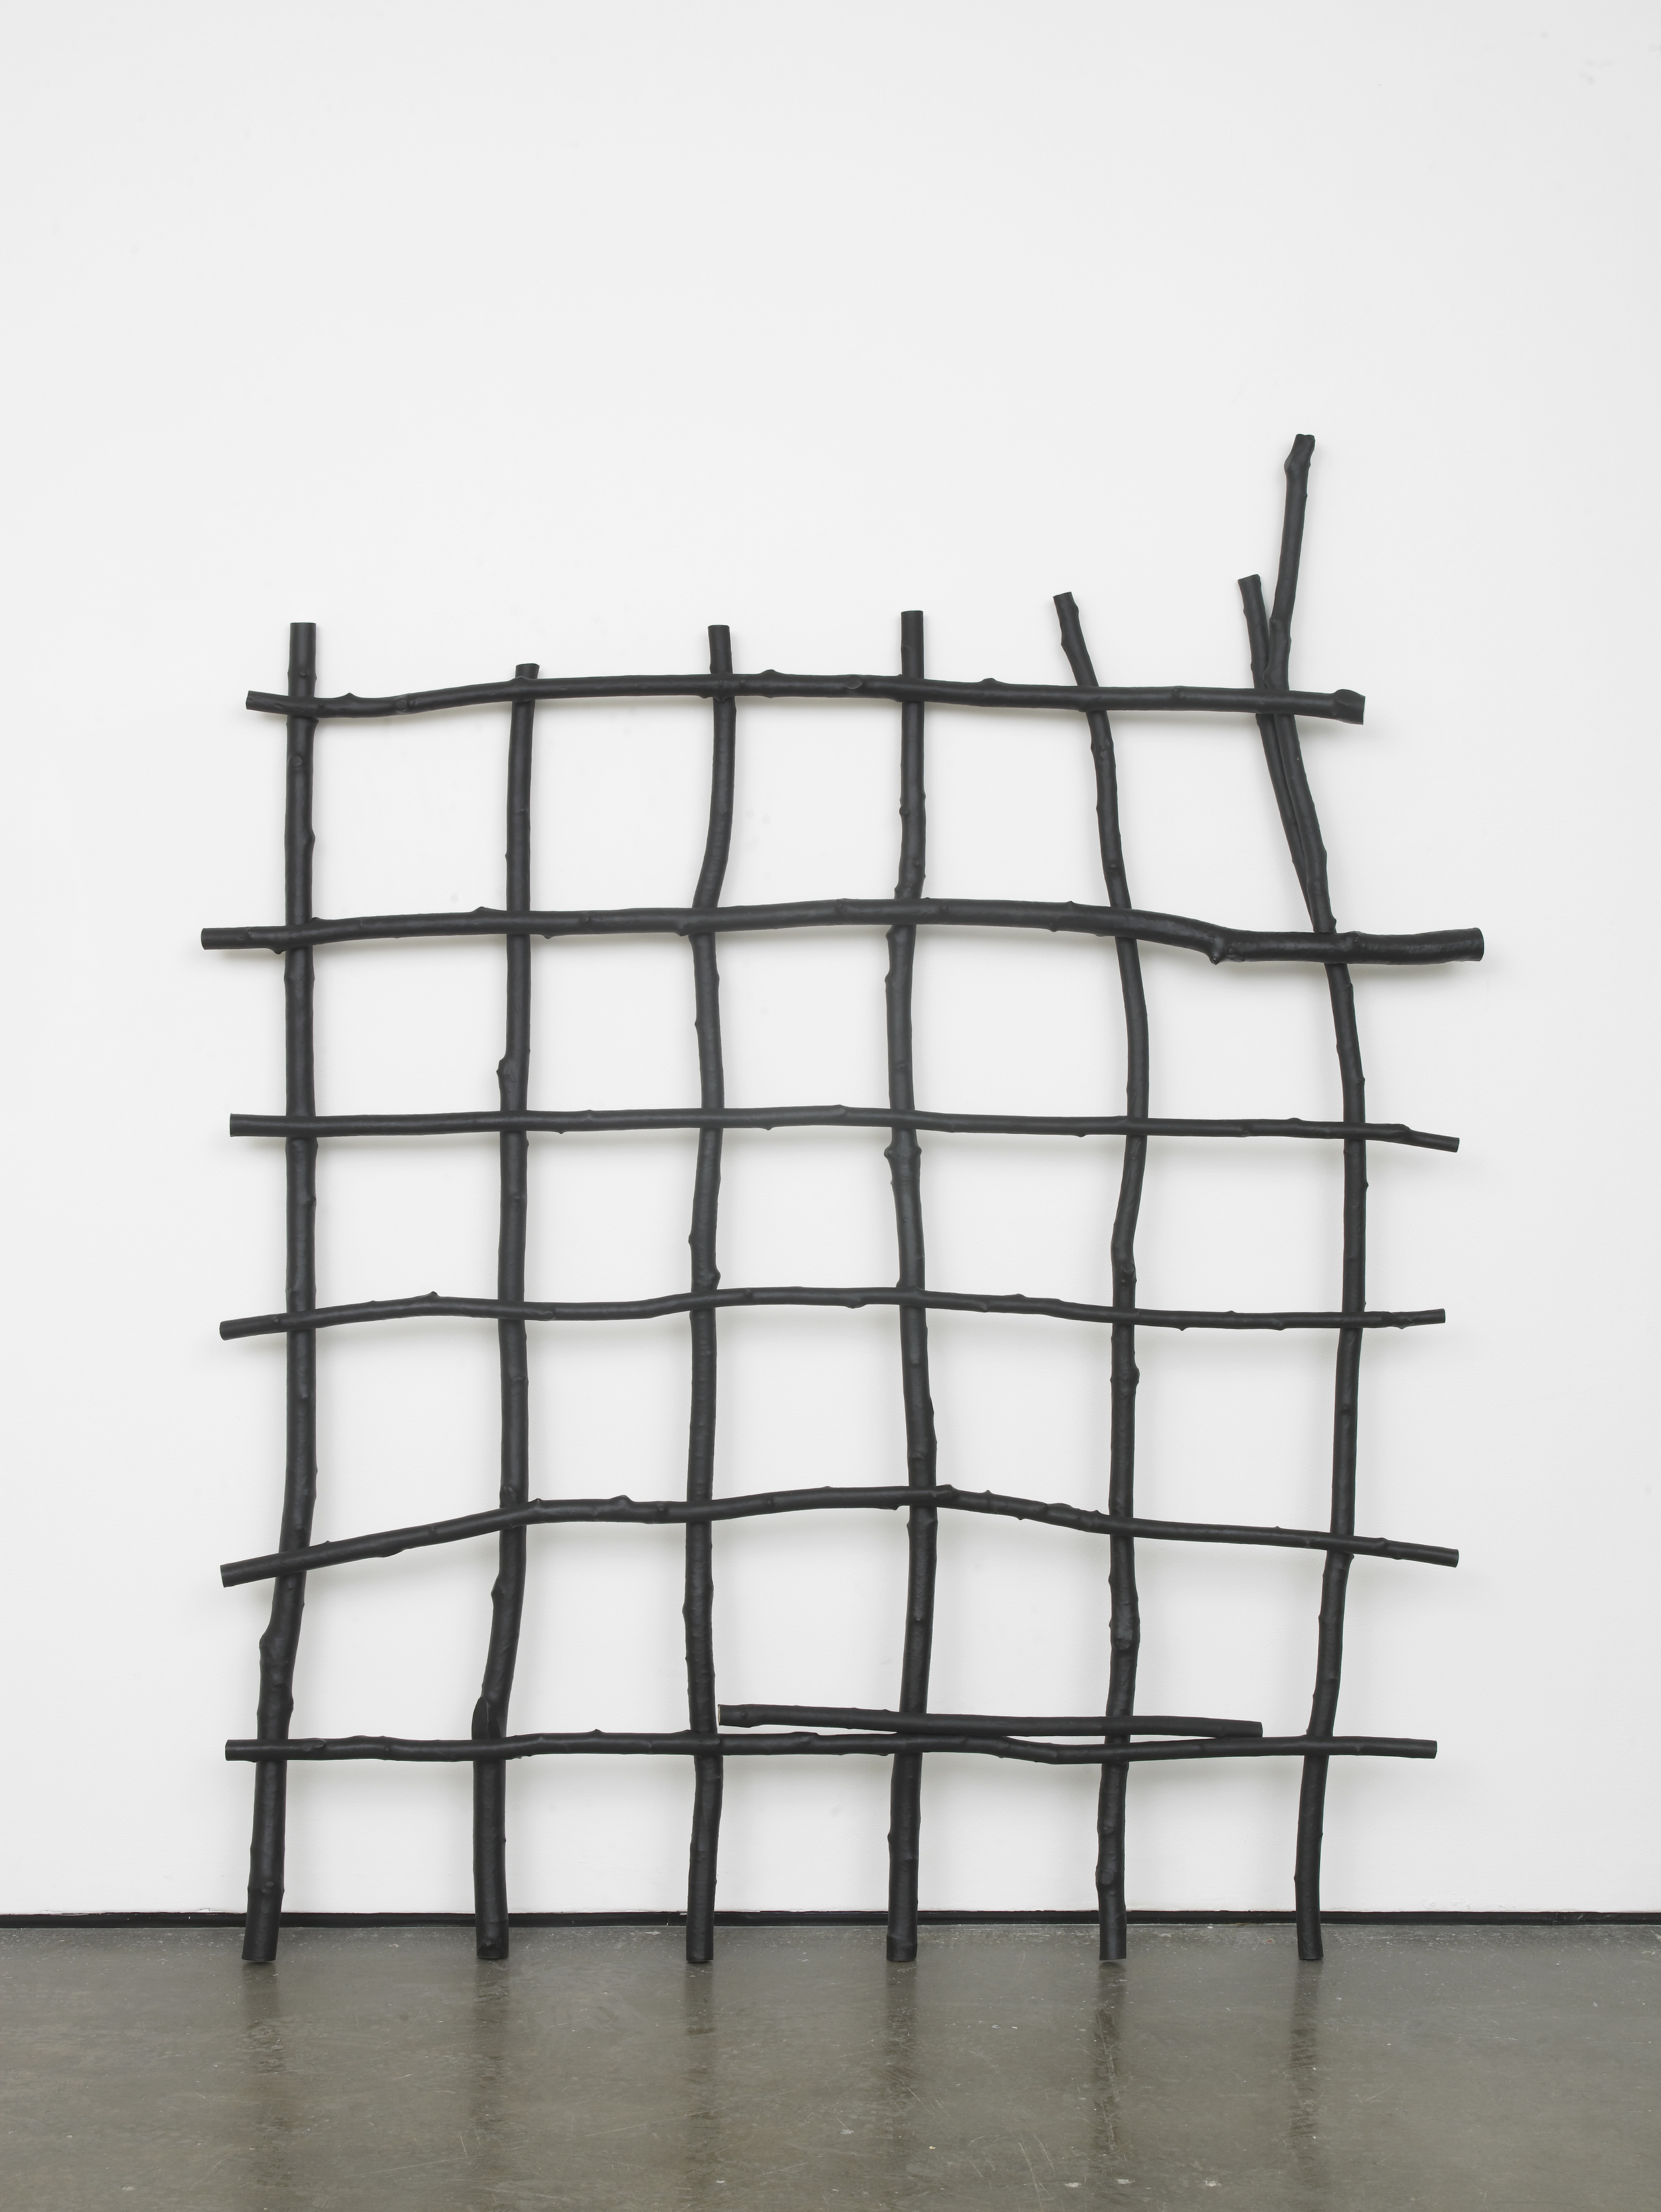 Kunststöcke 2016 PE, wood, metal 195 x 165 x 12 cm / 76.7 x 64.9 x 4.7 in